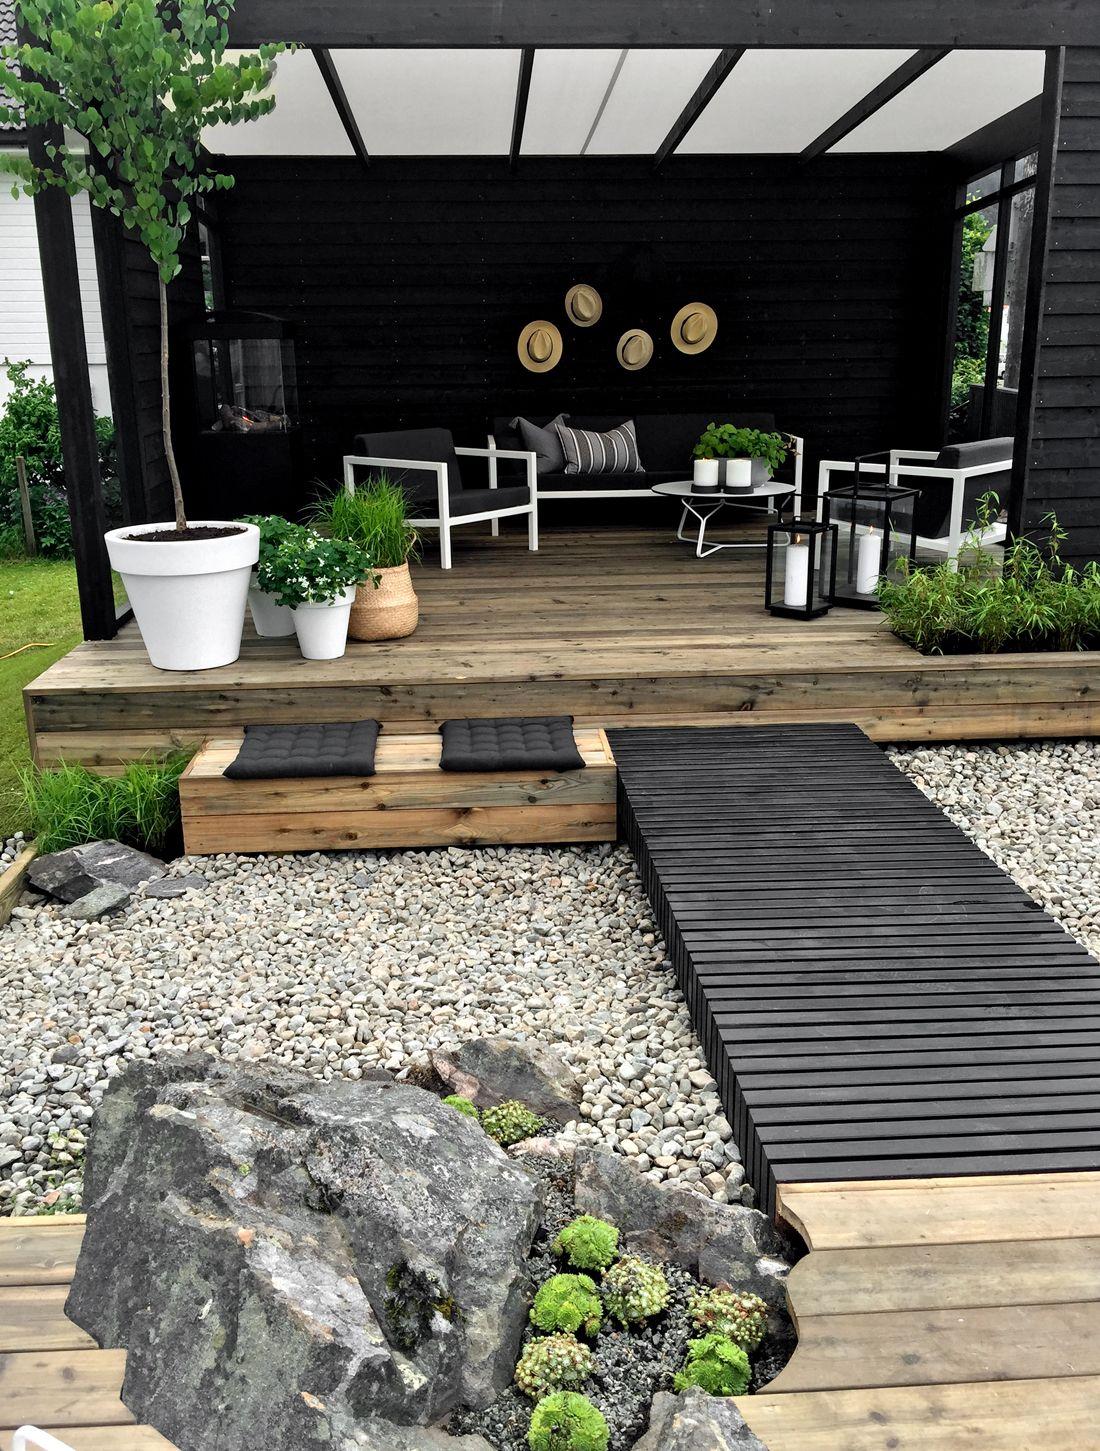 therese knutsen | tv garden design at tv2 | - outdoor living